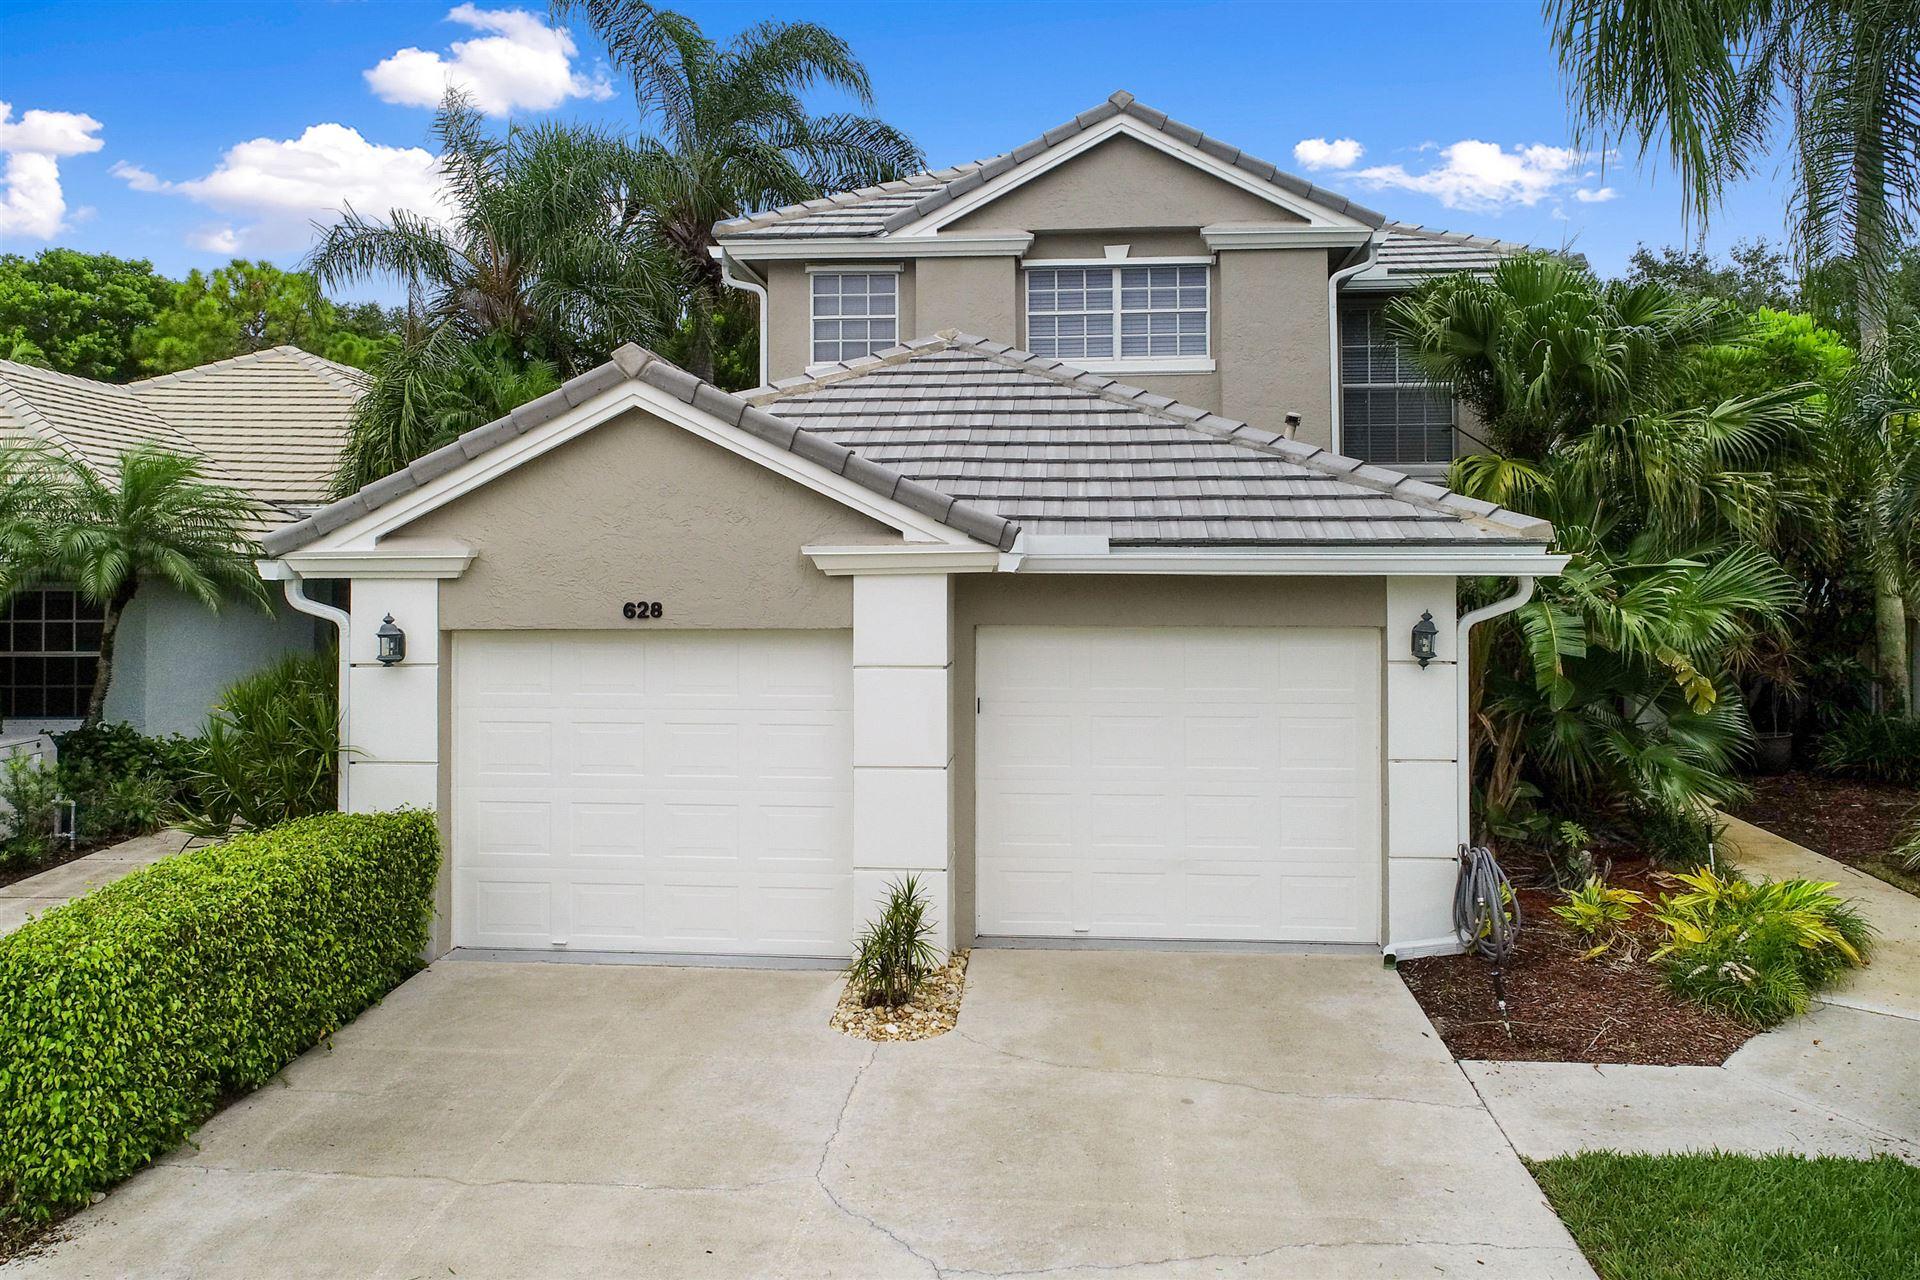 628 Masters Way, Palm Beach Gardens, FL 33418 - #: RX-10640951